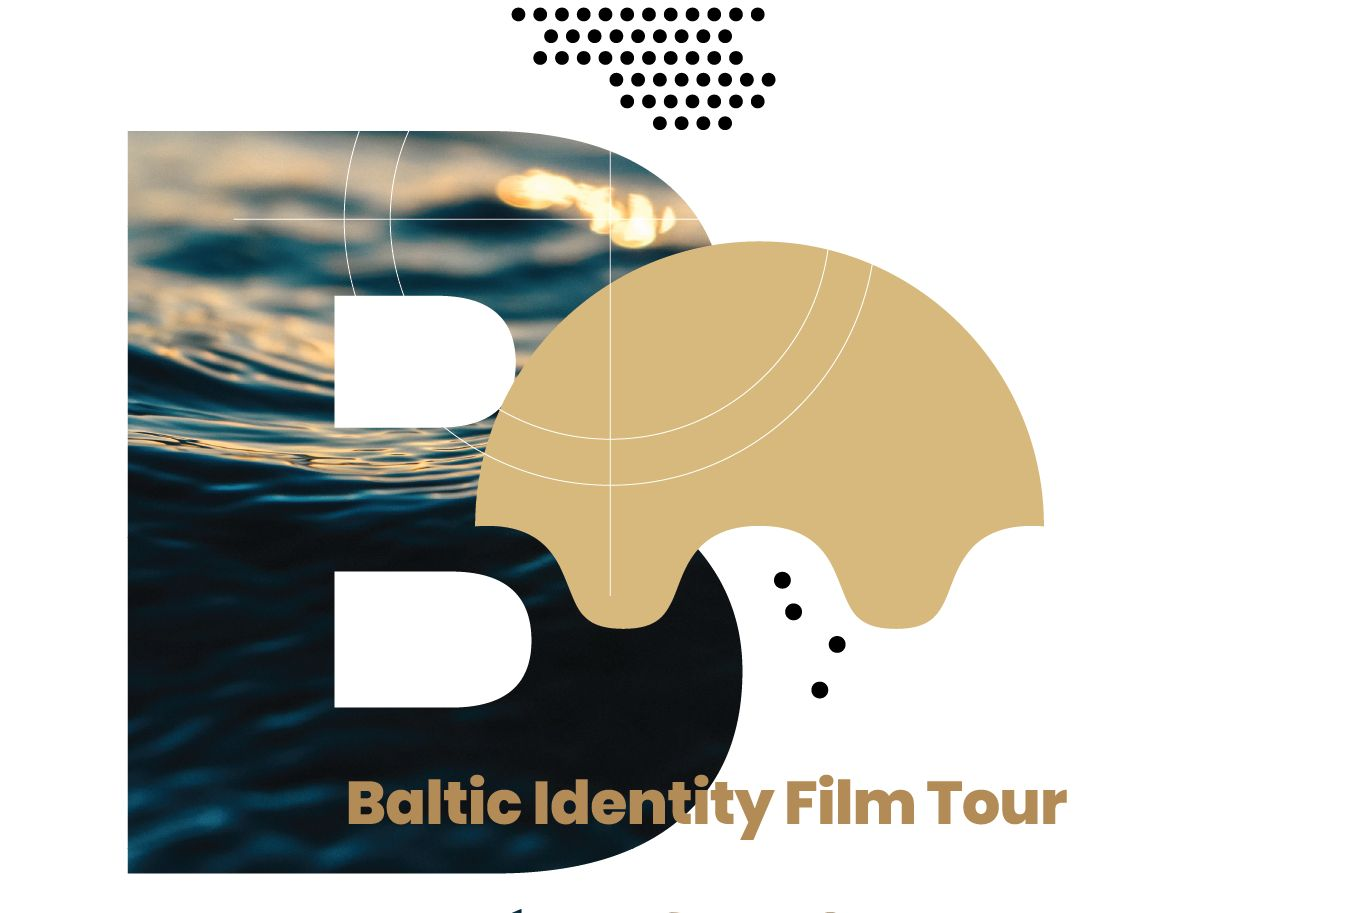 Baltic Identity Film Tour